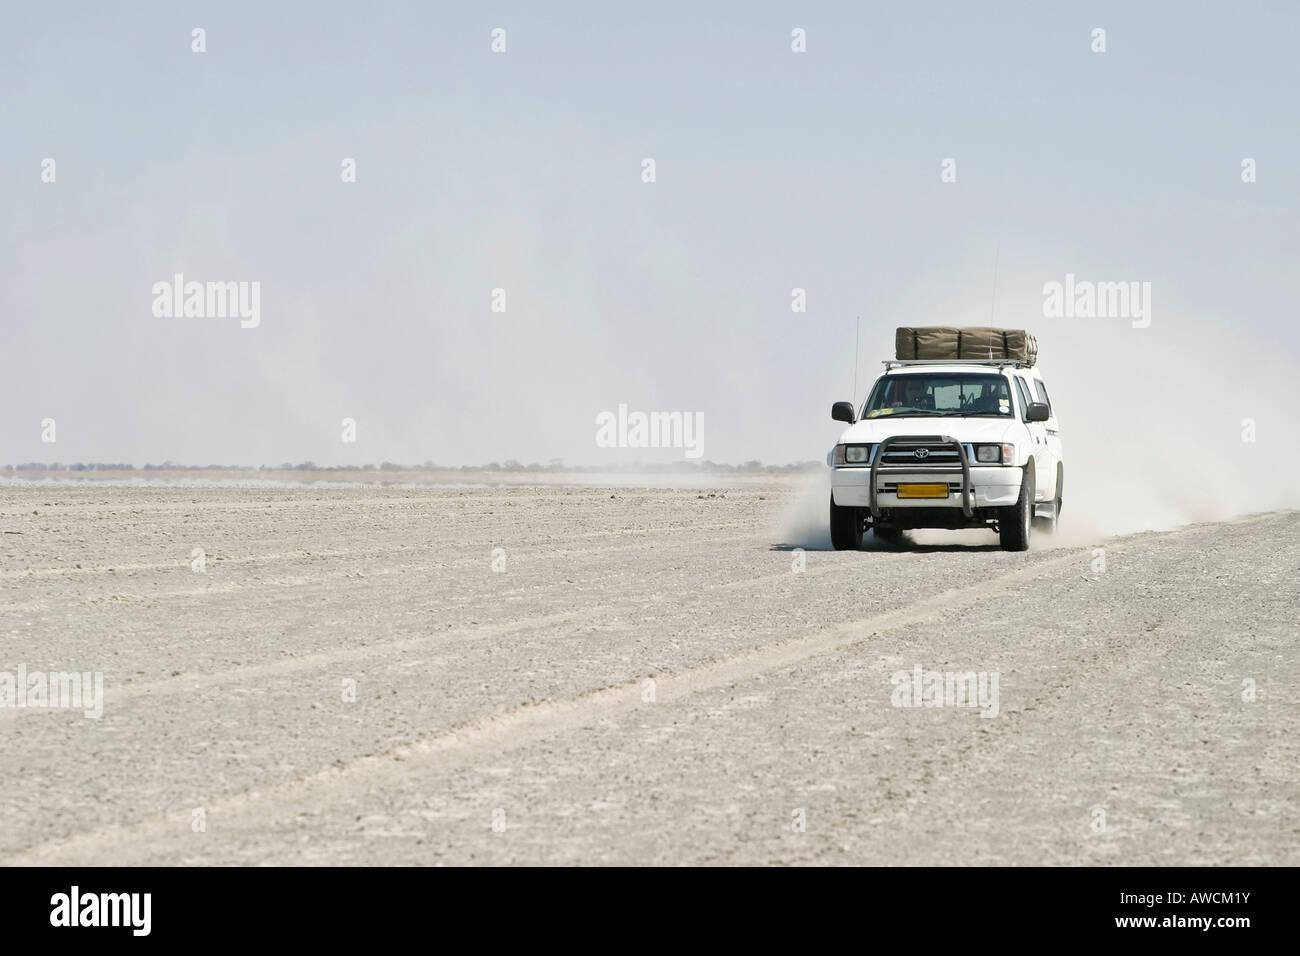 Offroad tour over a big salt pan, Sowa Pan, Makgadikgadi pans, Botswana, Africa - Stock Image